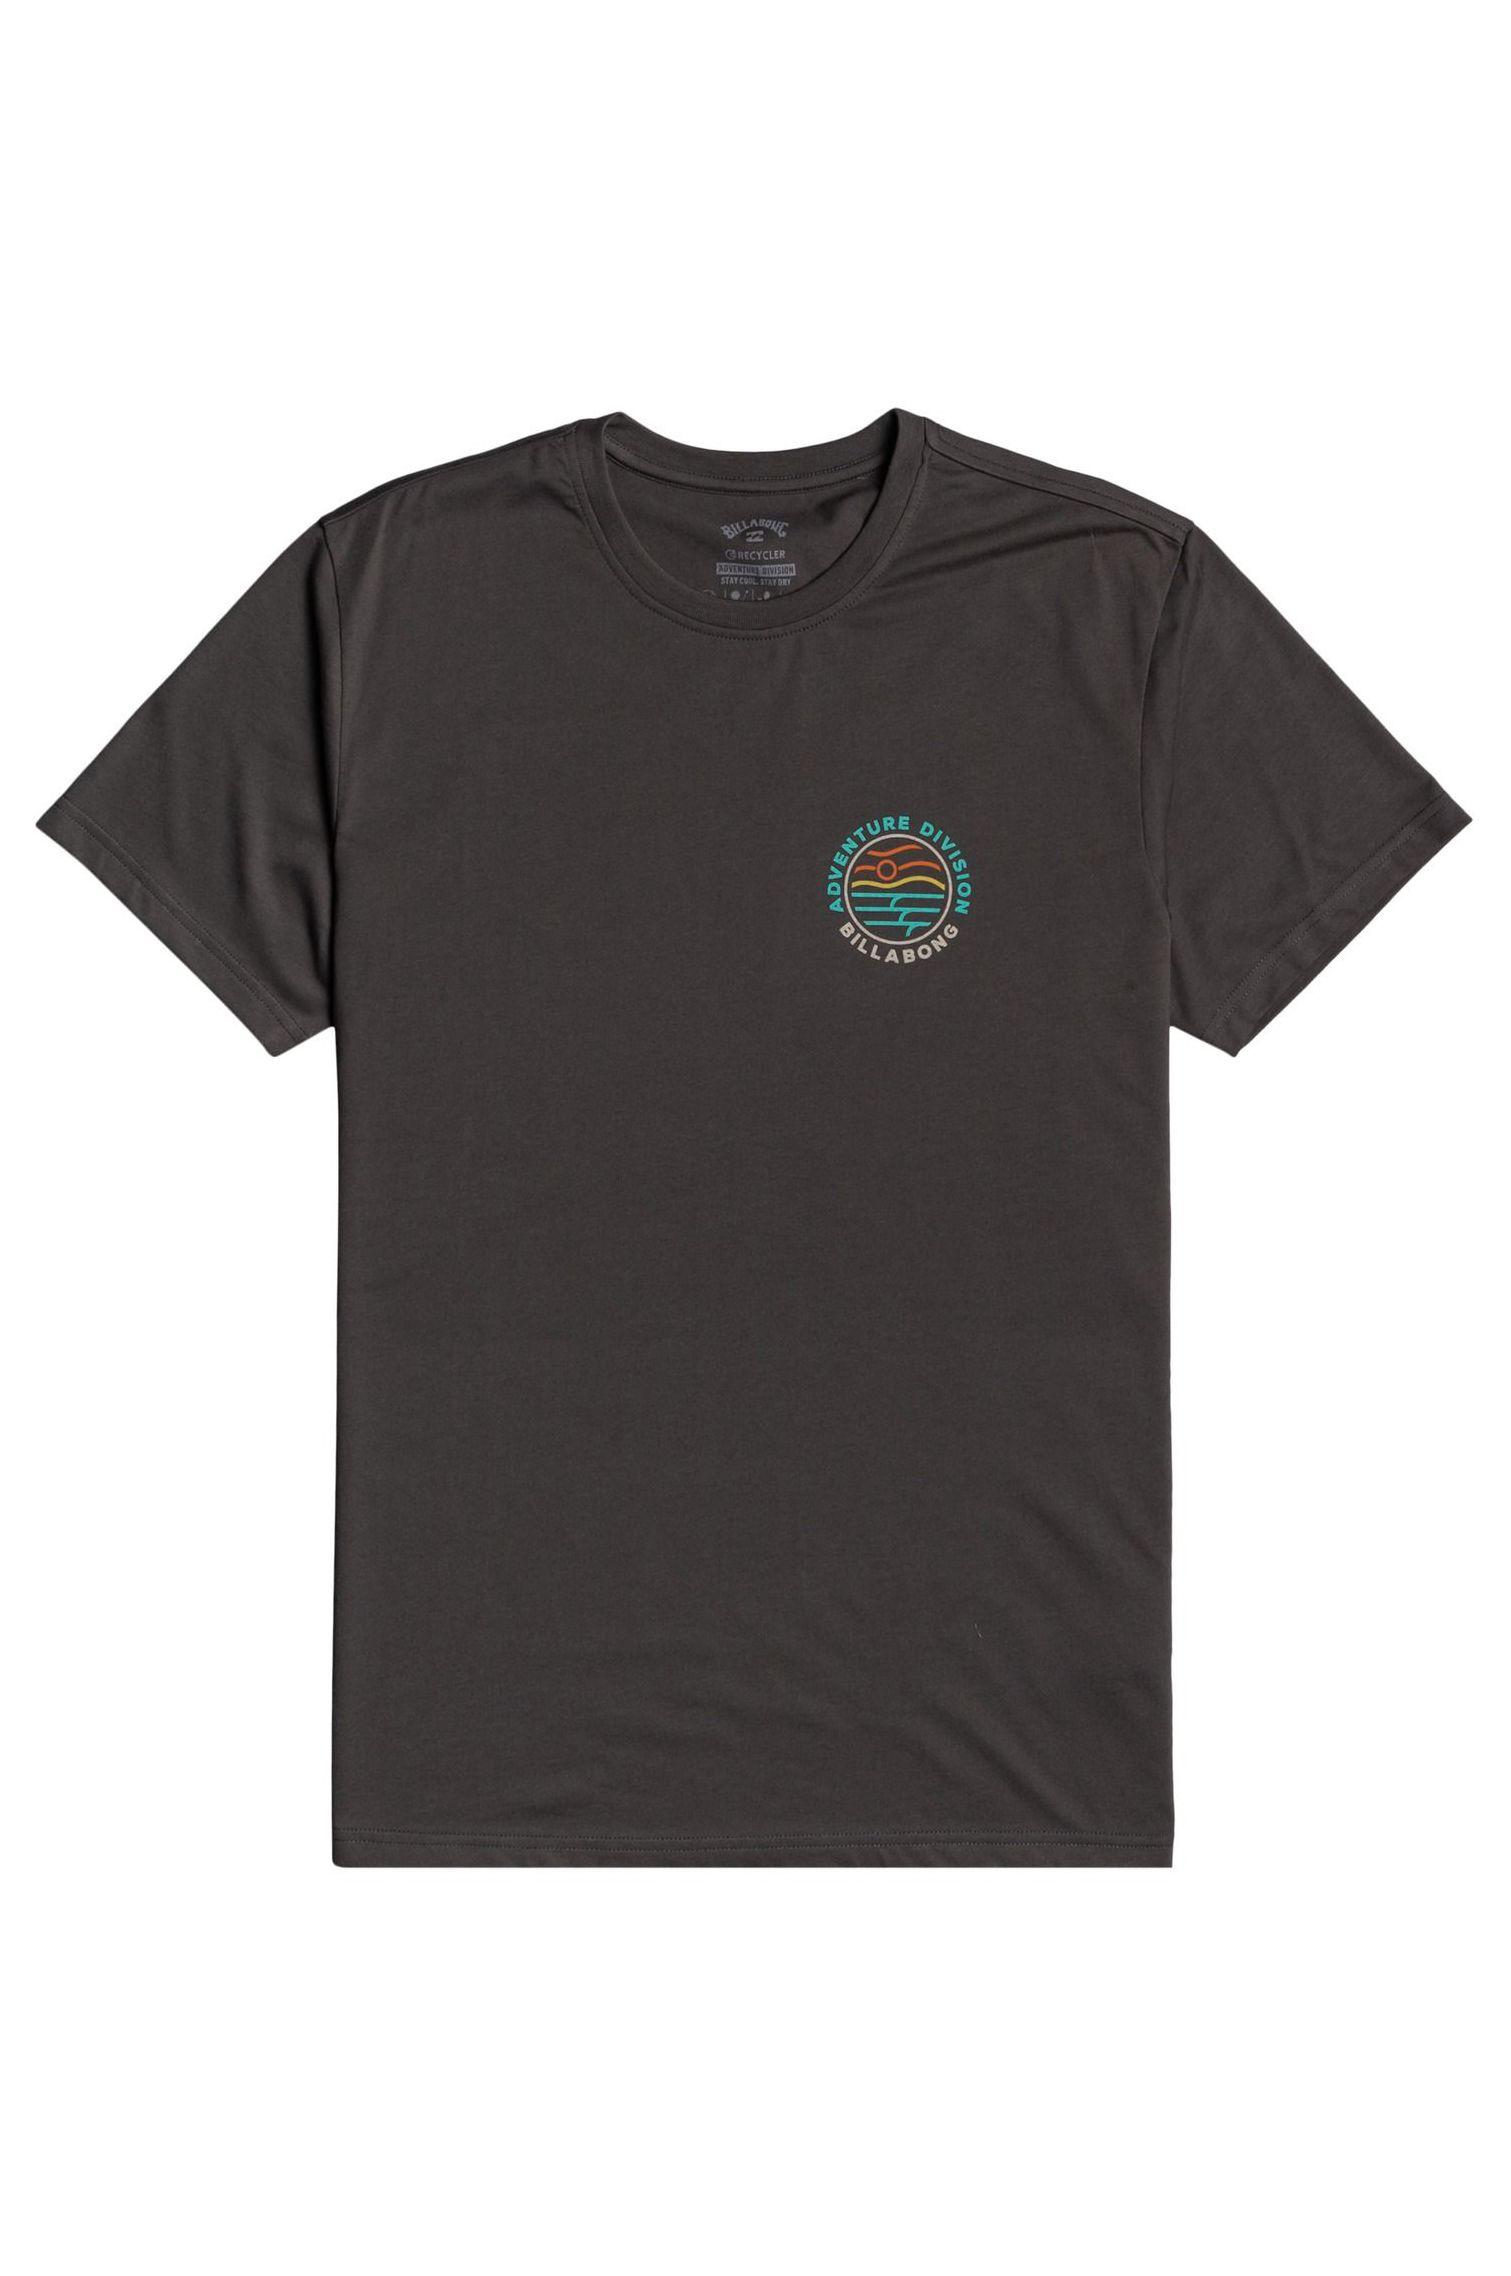 T-Shirt Billabong VIEW SS ADVENTURE DIVISION Raven